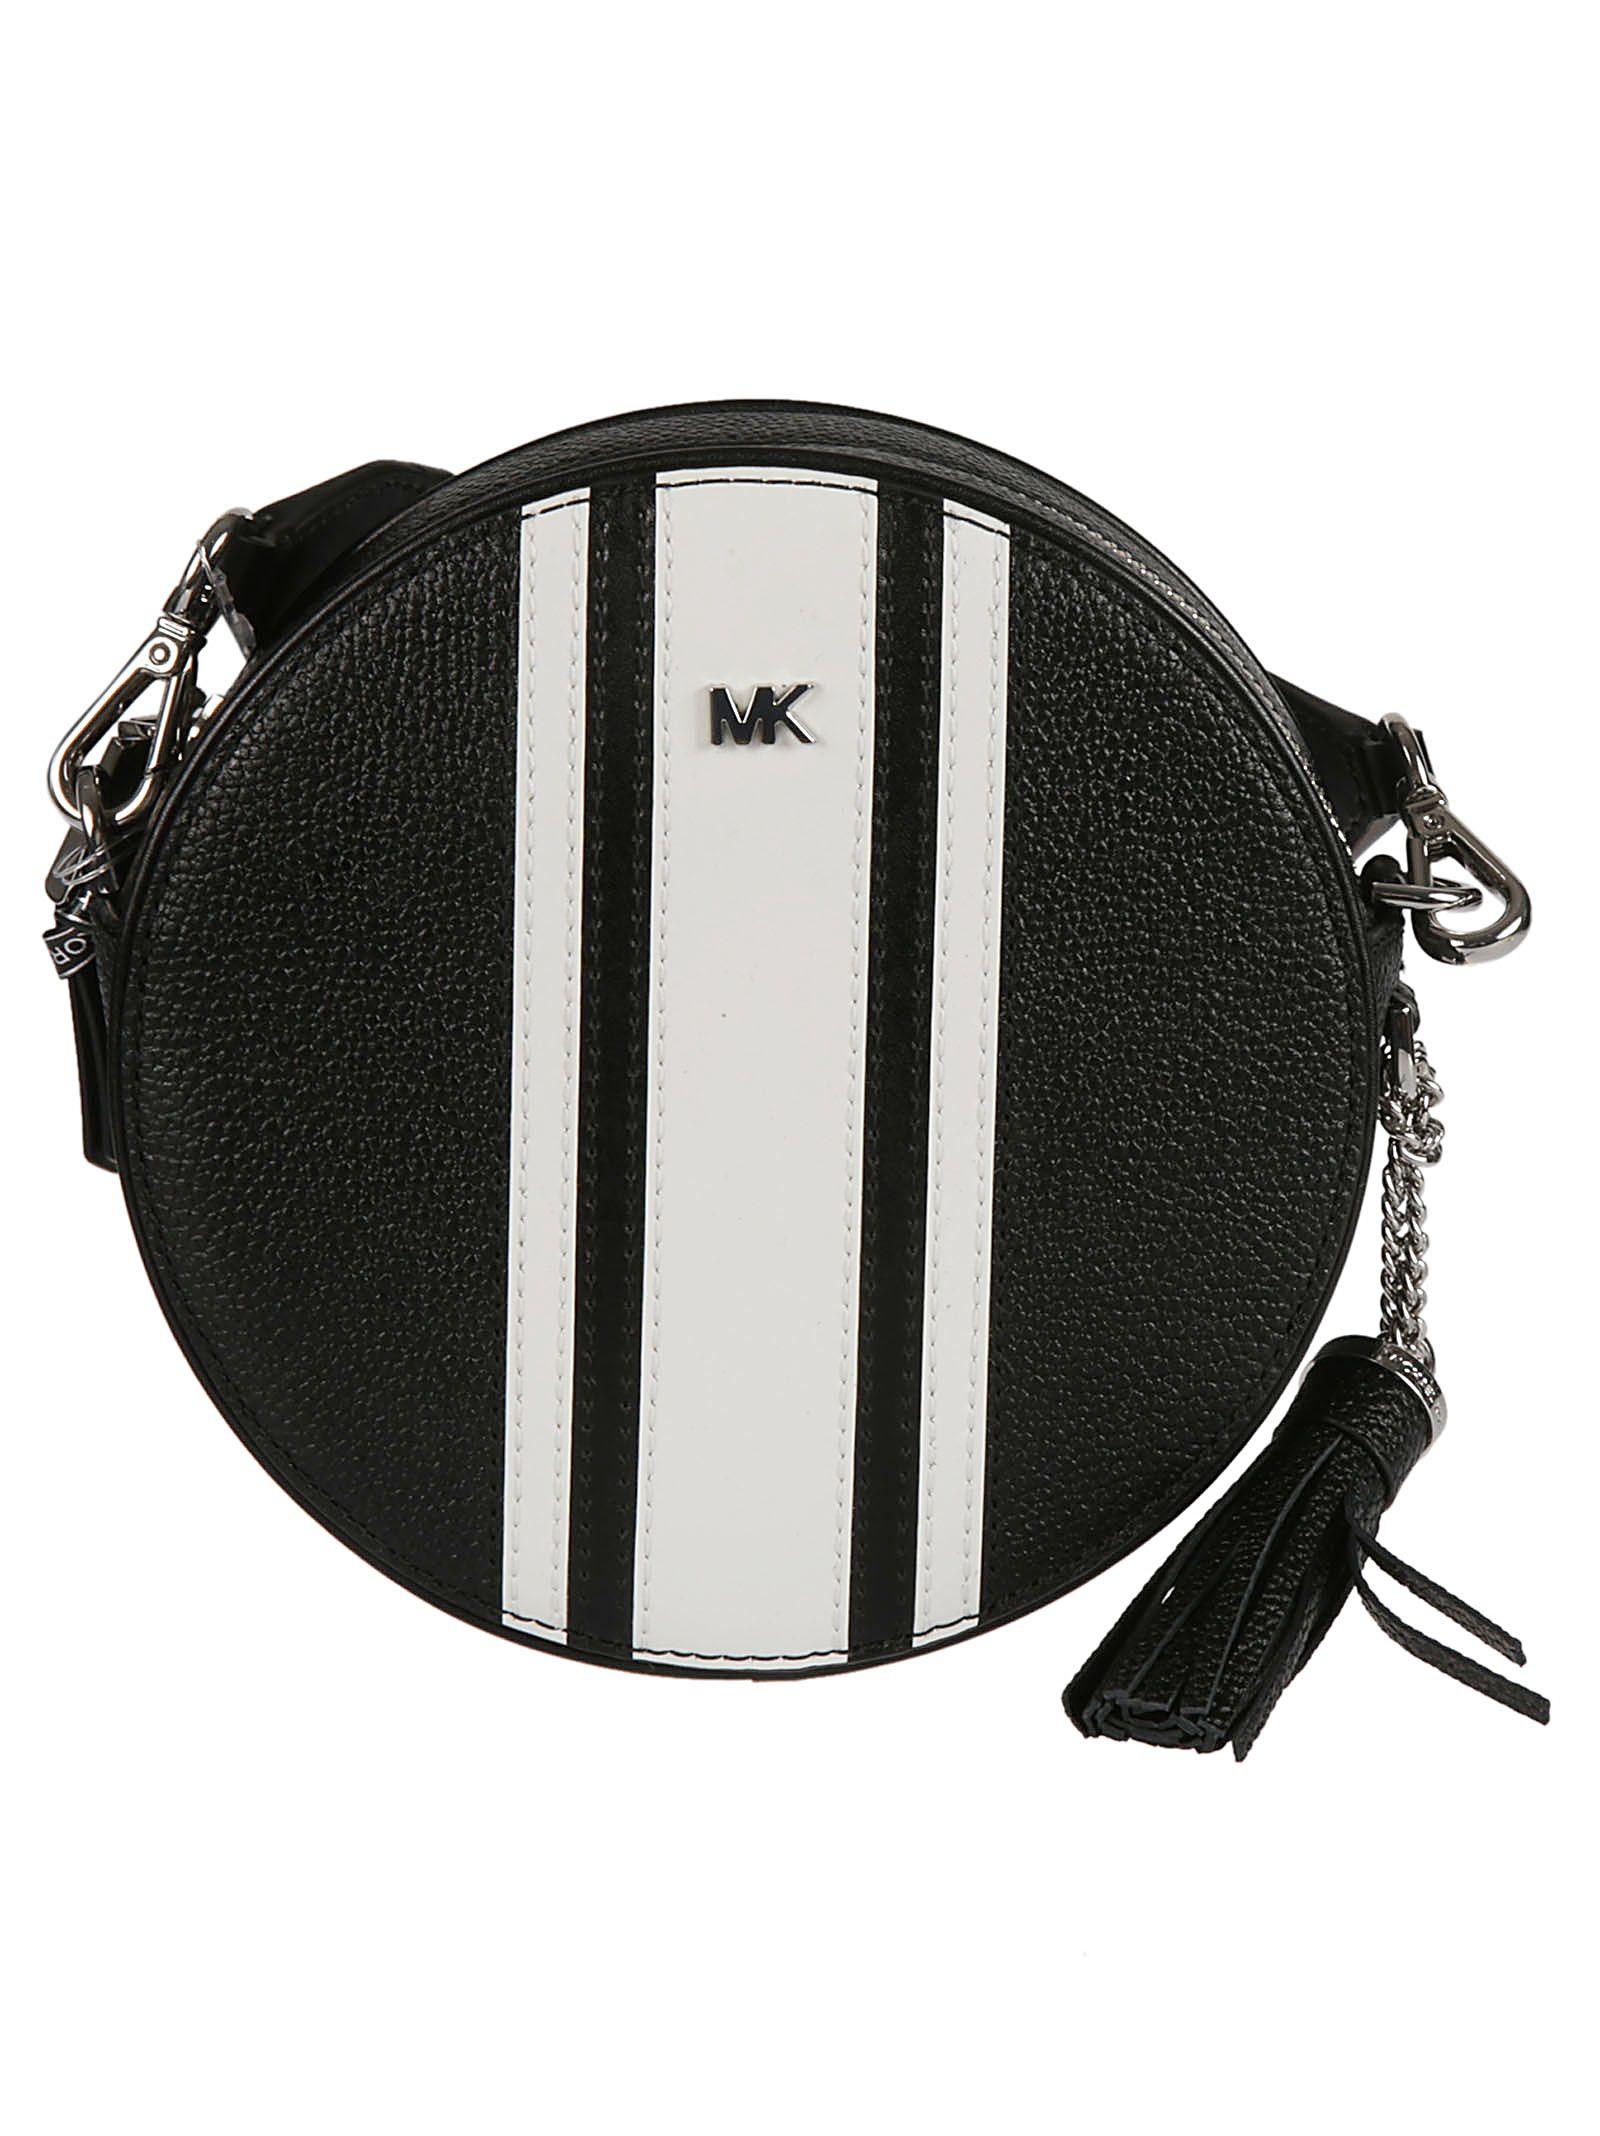 bd508cae4d10 Michael Kors Michael Kors Canteen Crossbody Bag - Black/optic white ...